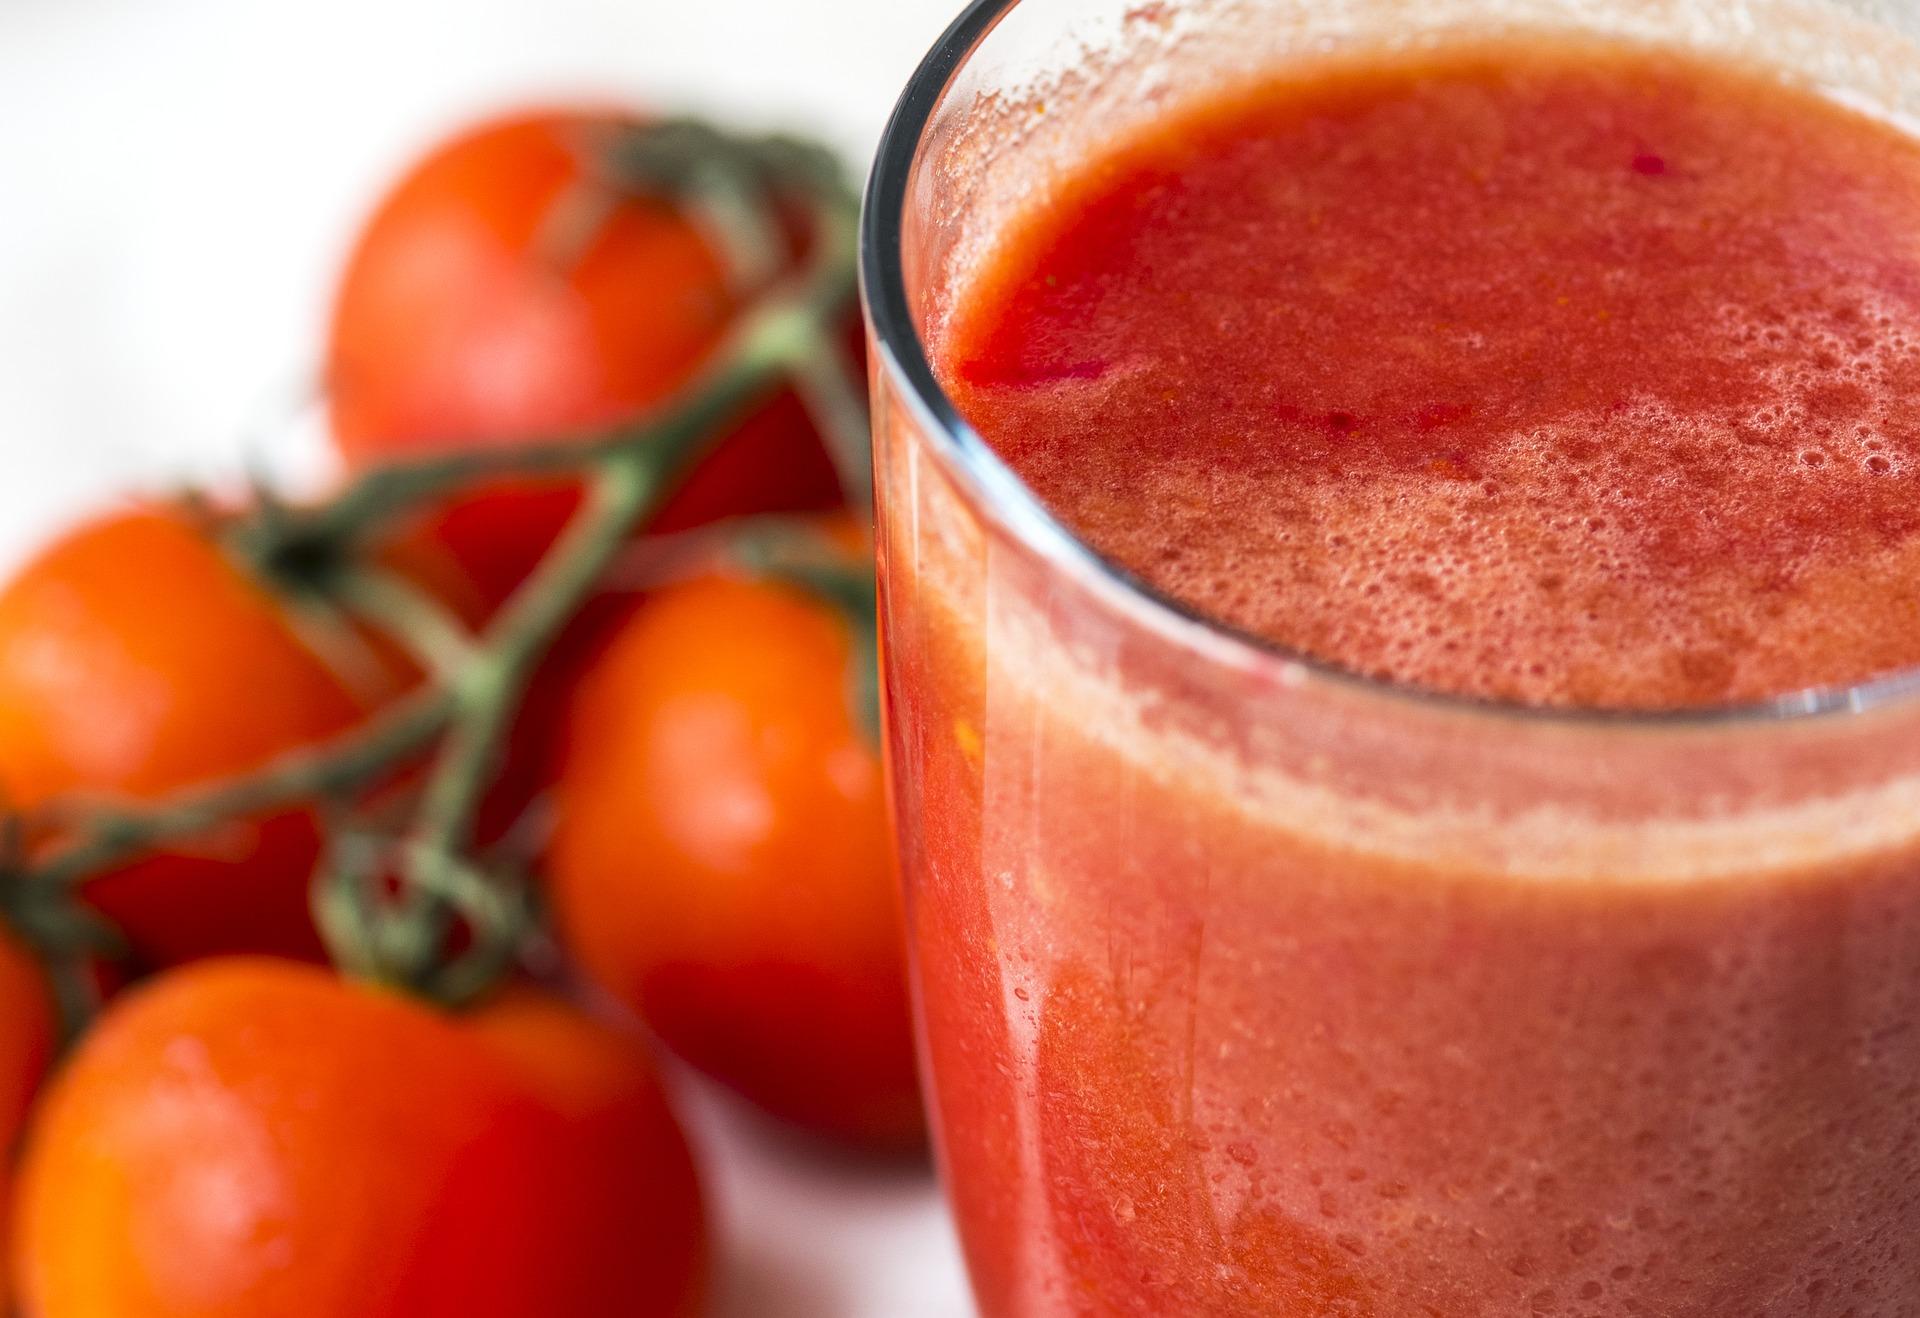 Warm glass of fresh tomato juice